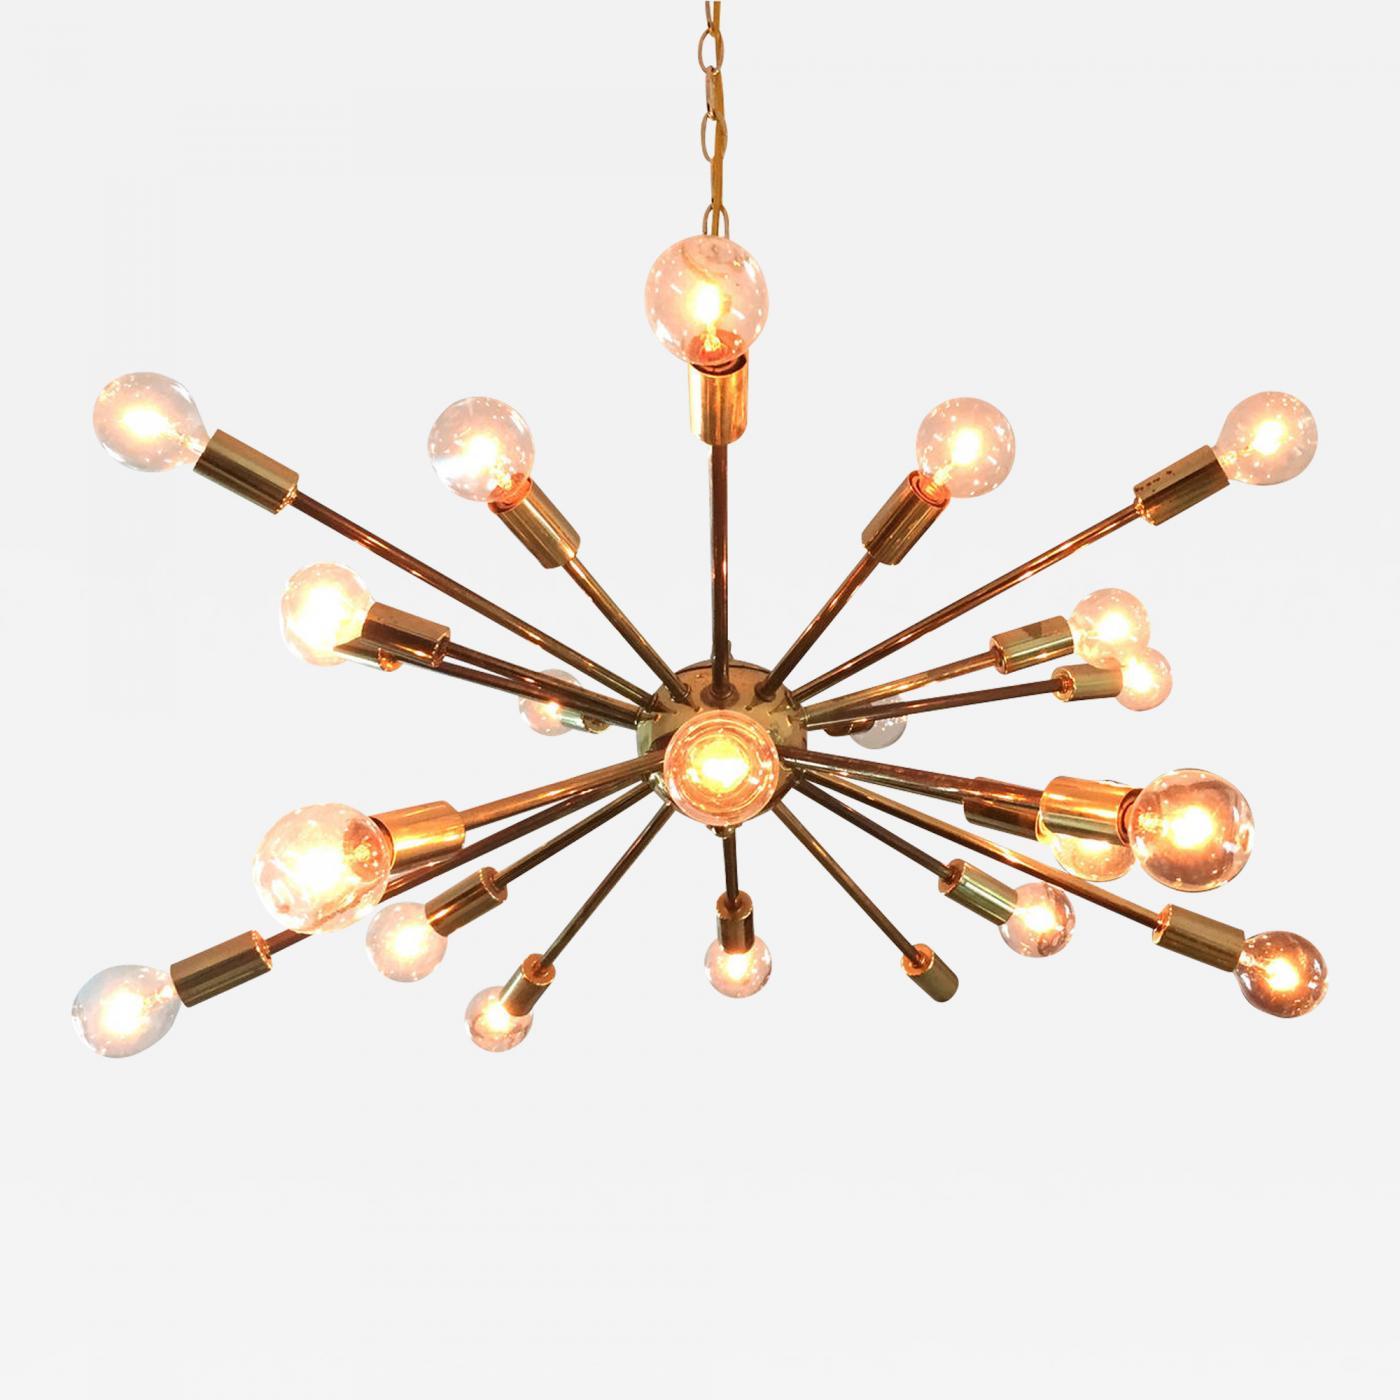 bed kitchen itm mount pendant lighting semi ceiling flush for light modern dining chandelier brass vinluz room sputnik